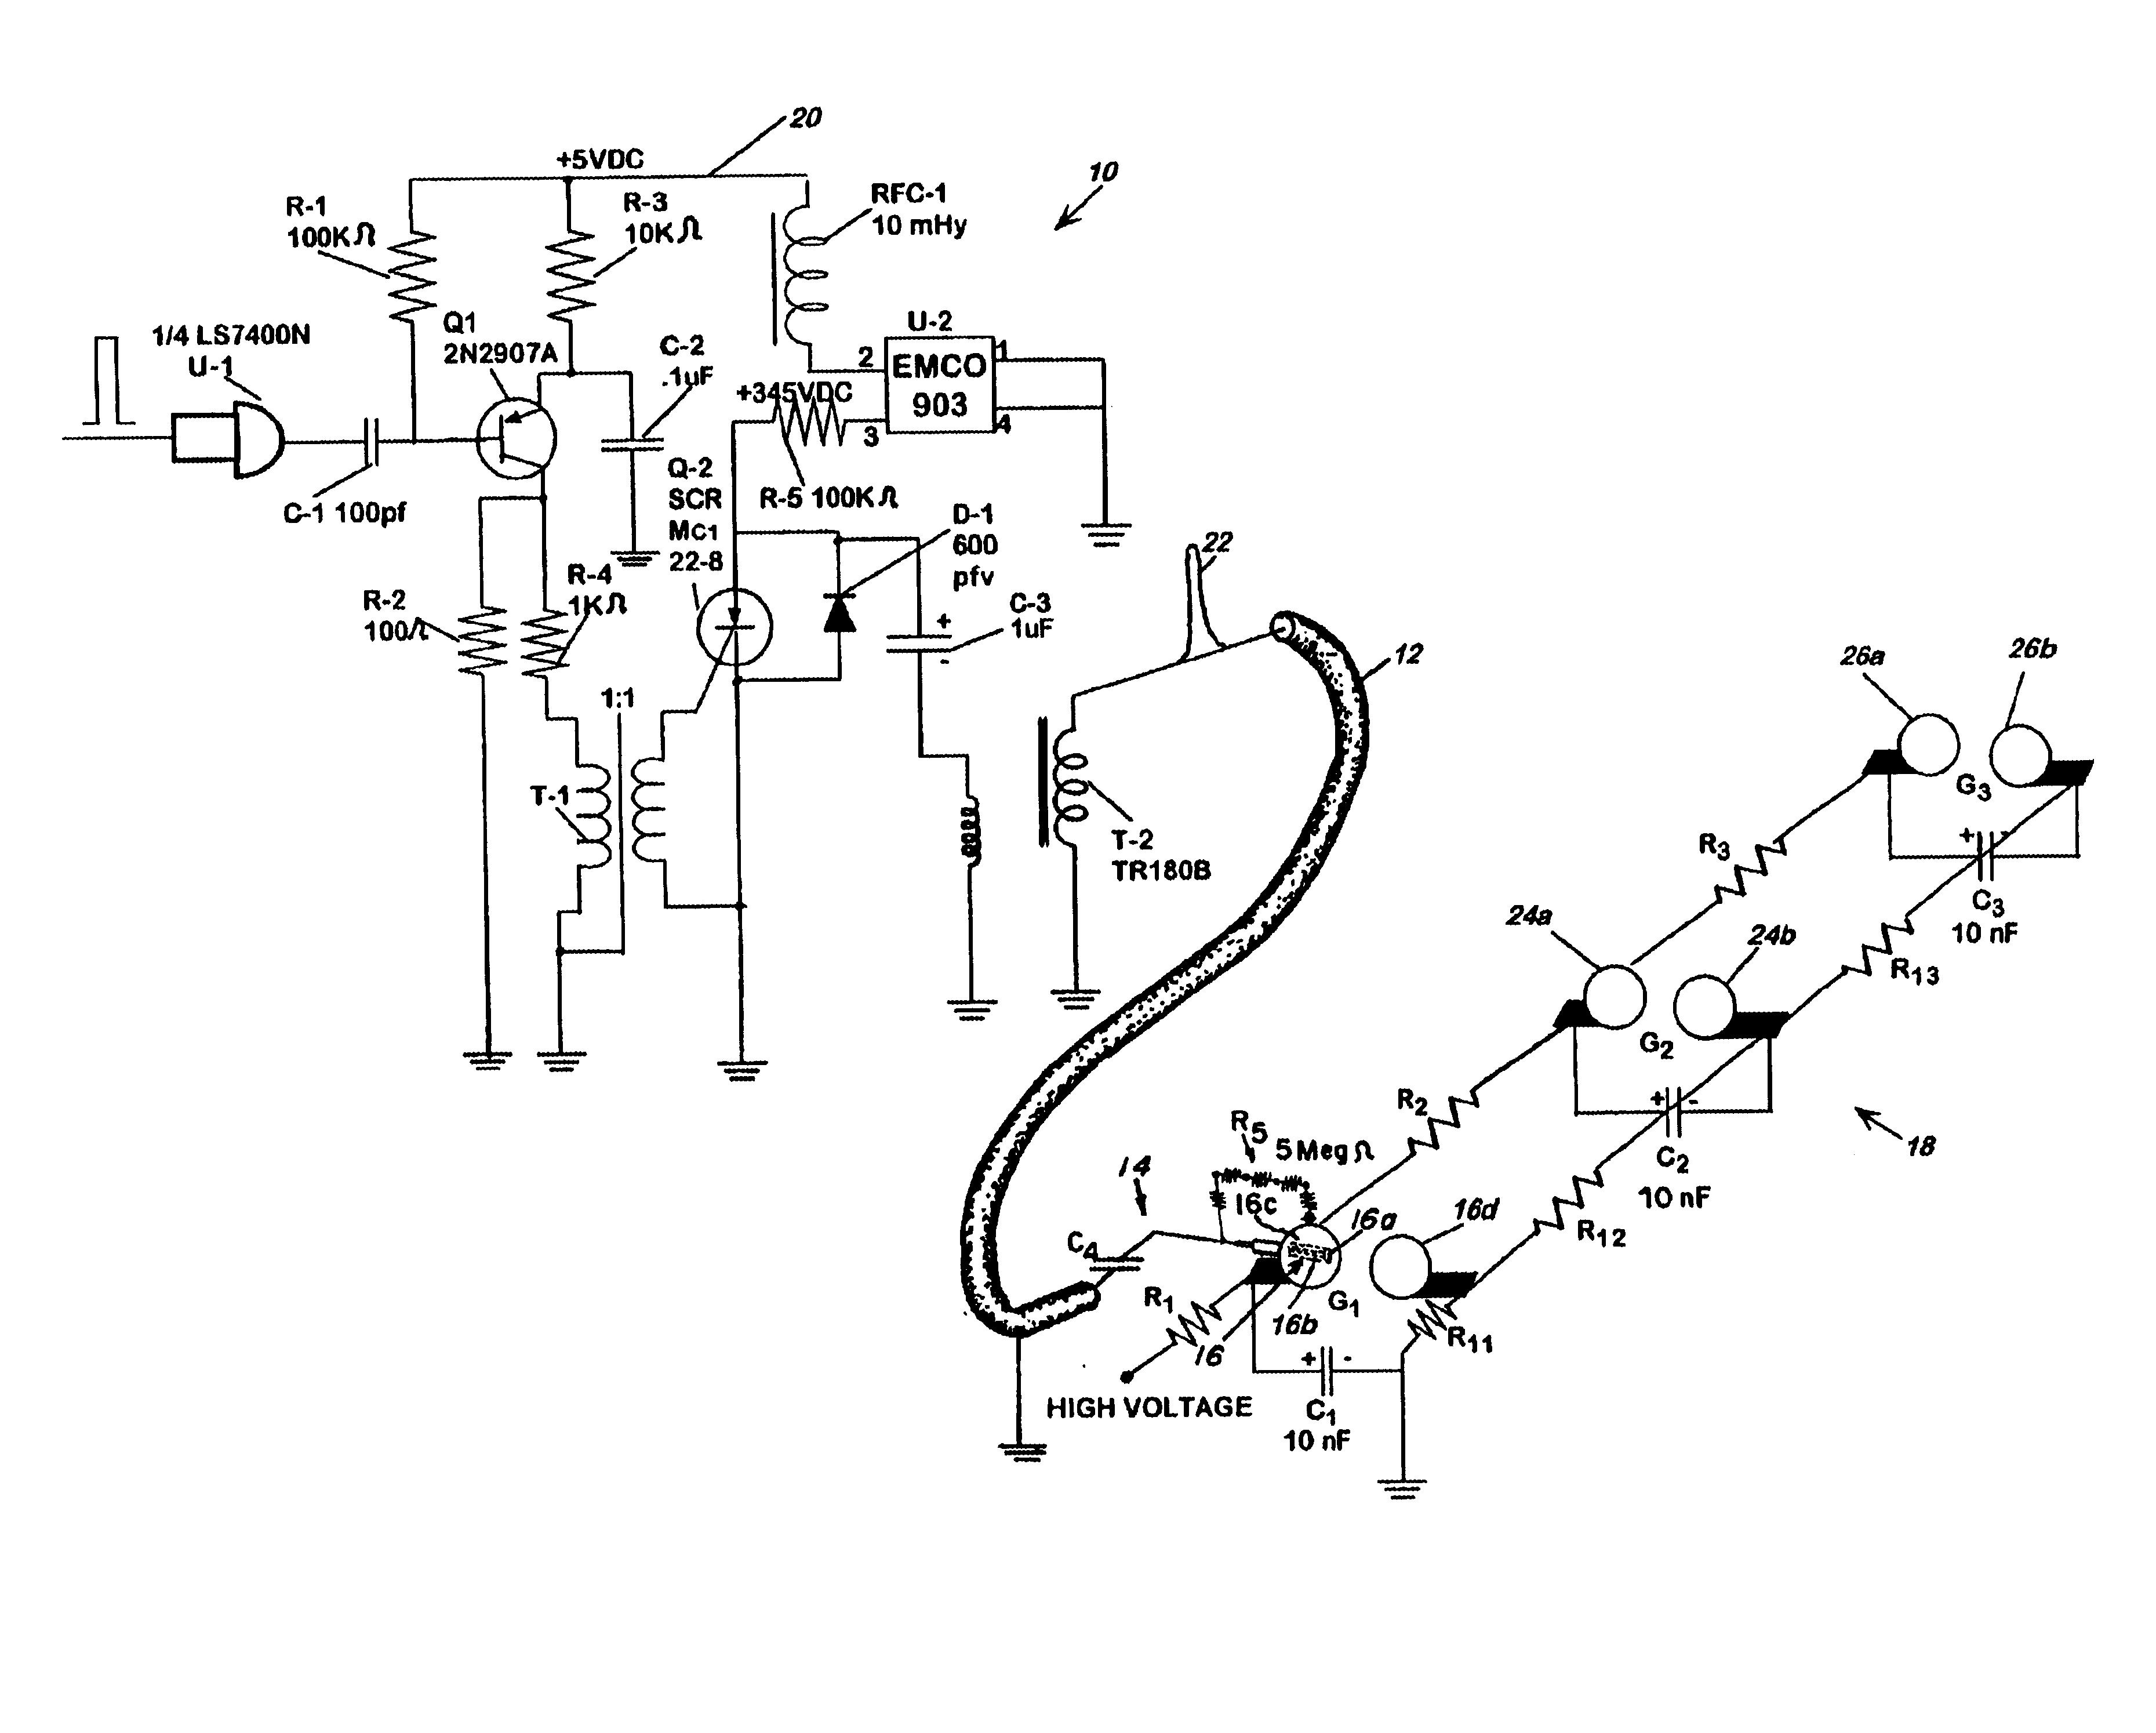 brevet us6690566 trigger circuit for marx generators brevets DC 5V USB Adapter patent drawing